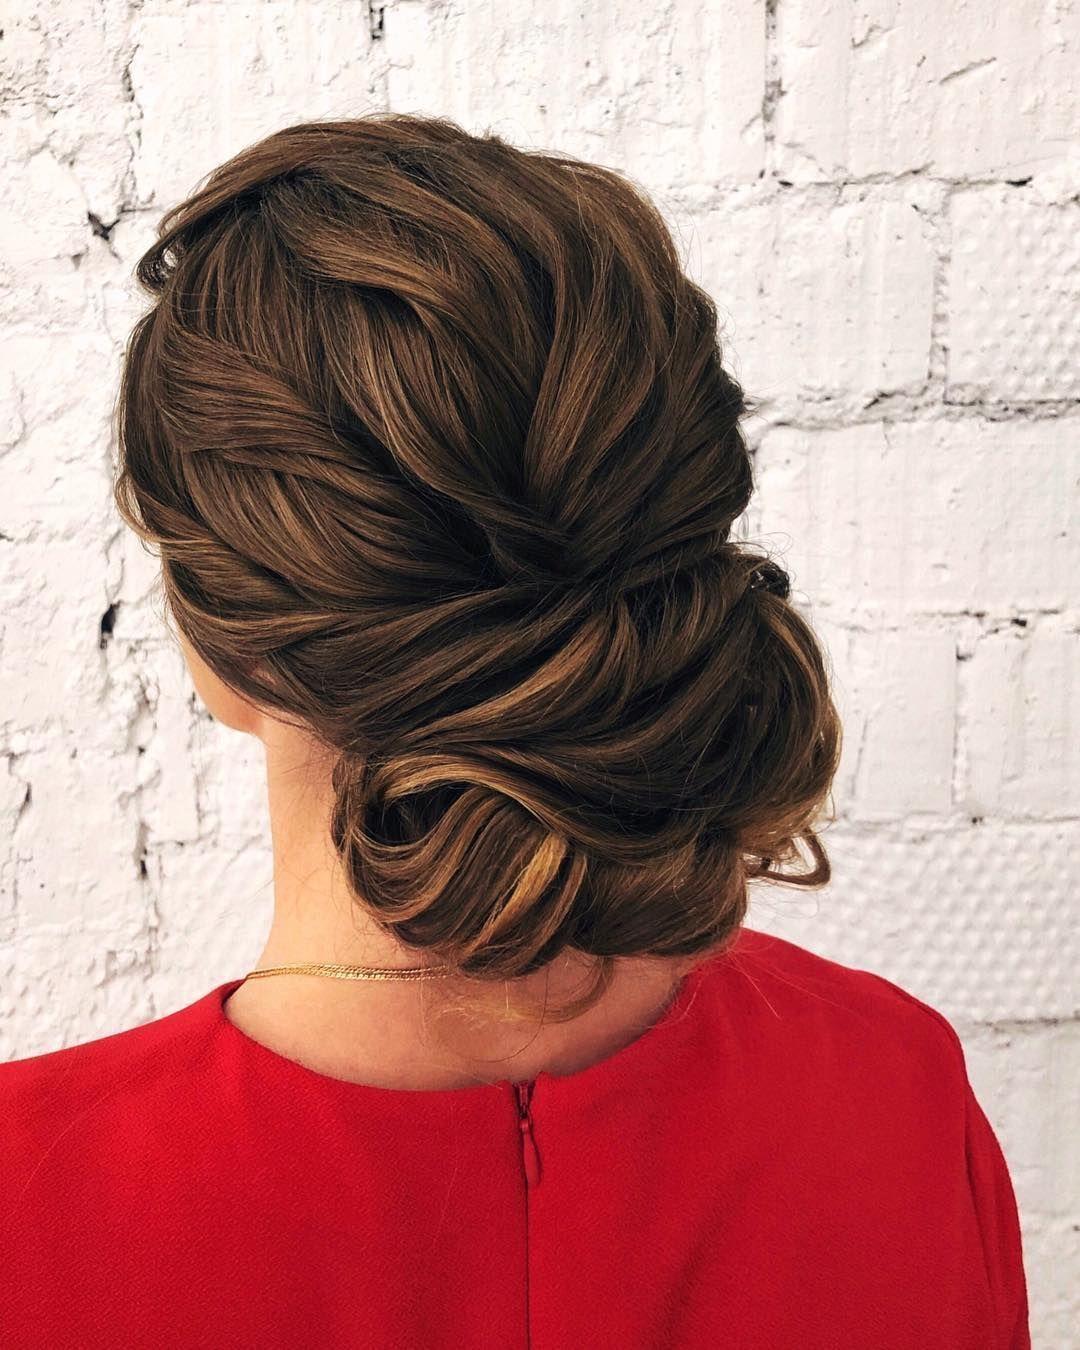 Textured updo updo wedding hairstylesupdo hairstylesmessy updos